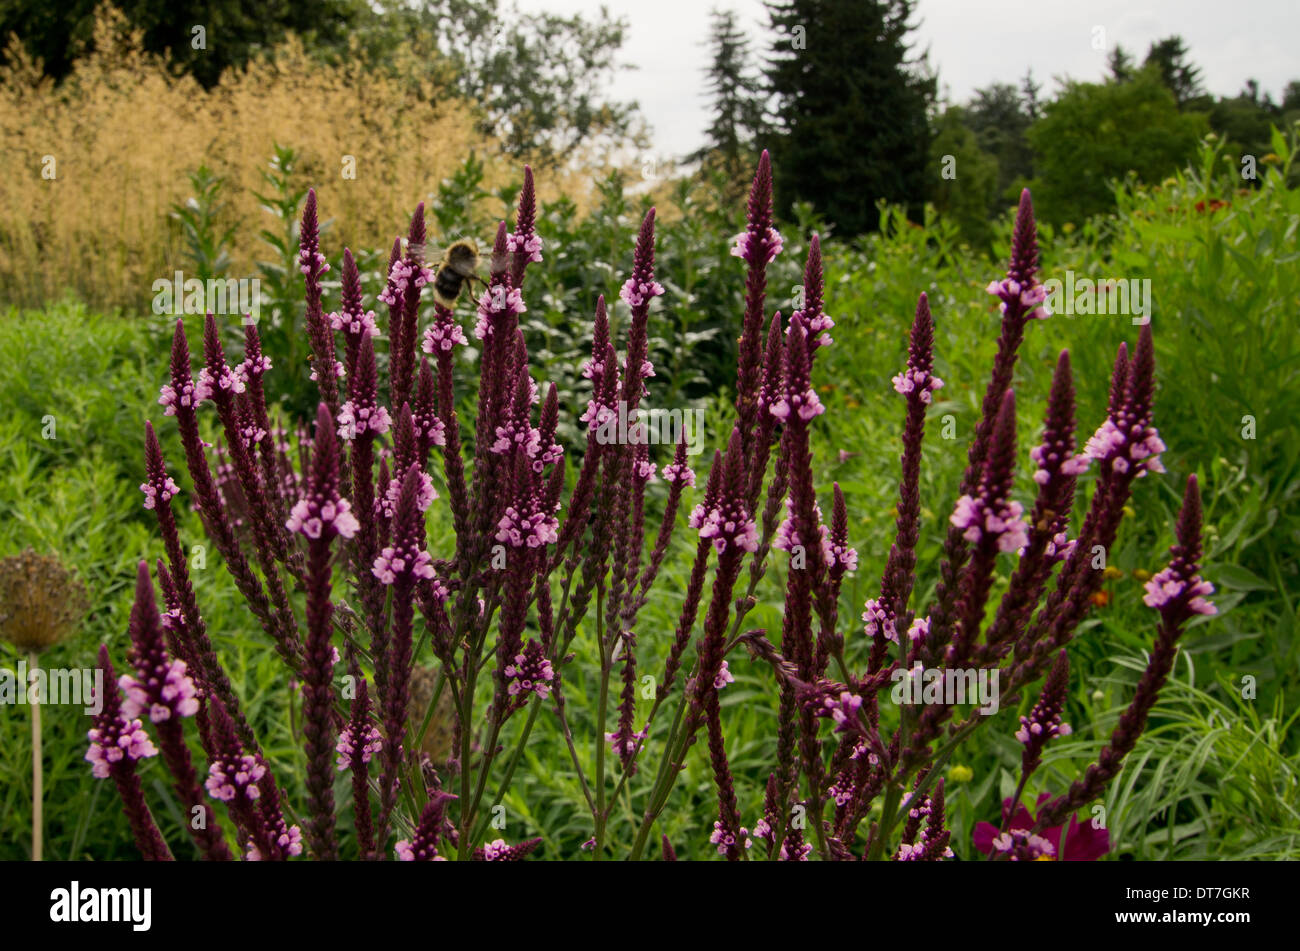 Verbena hastata rosea Stock Photo: 66549611 - Alamy